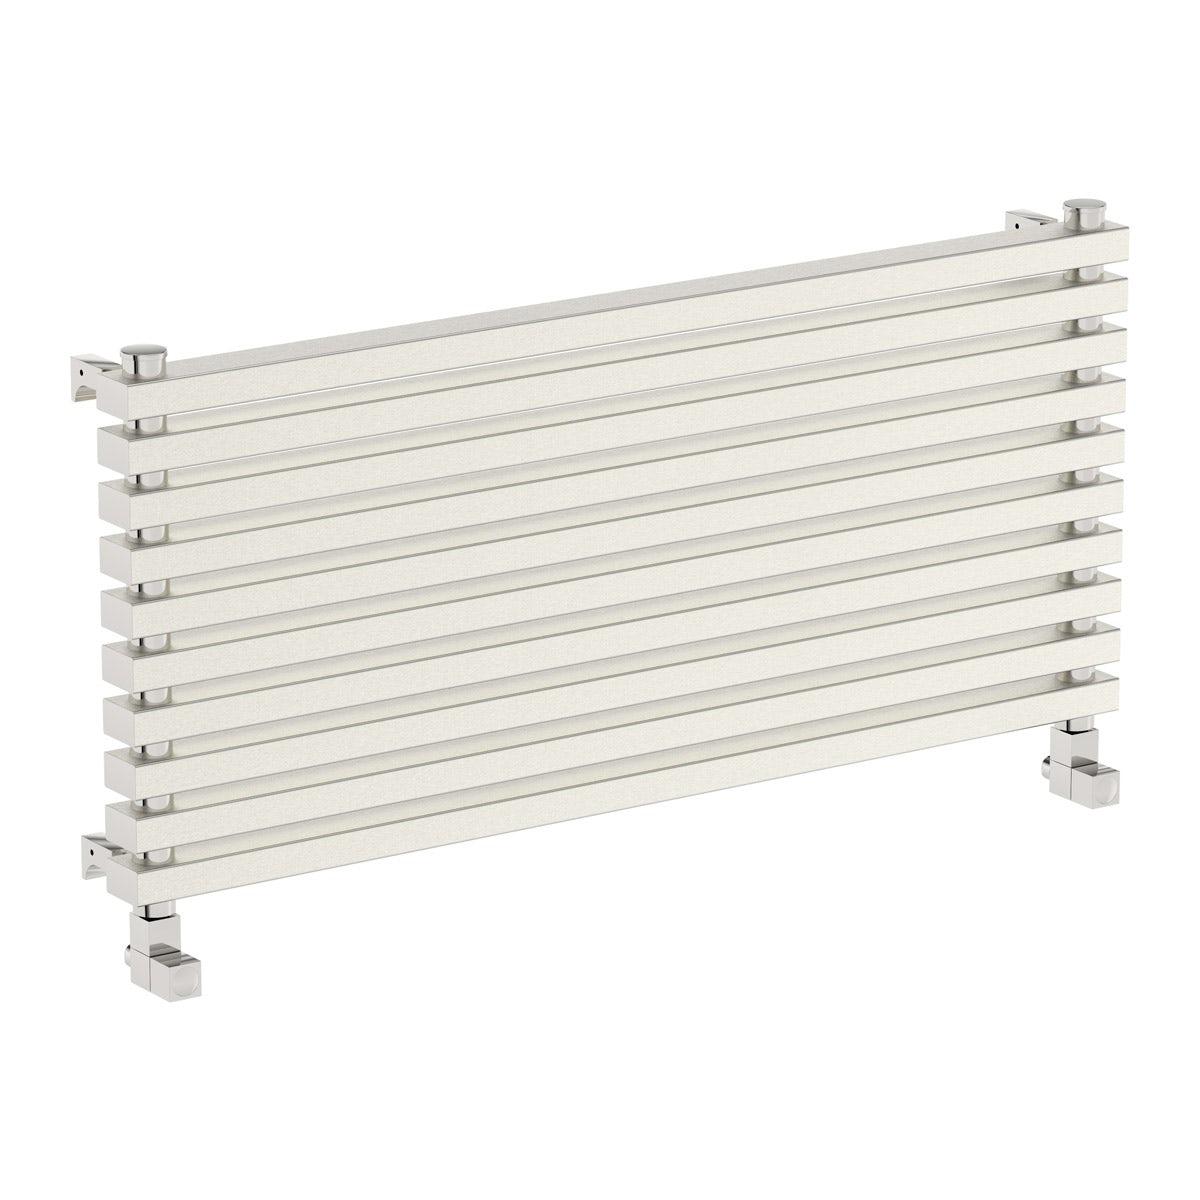 Cadence horizontal radiator 465 x 1000